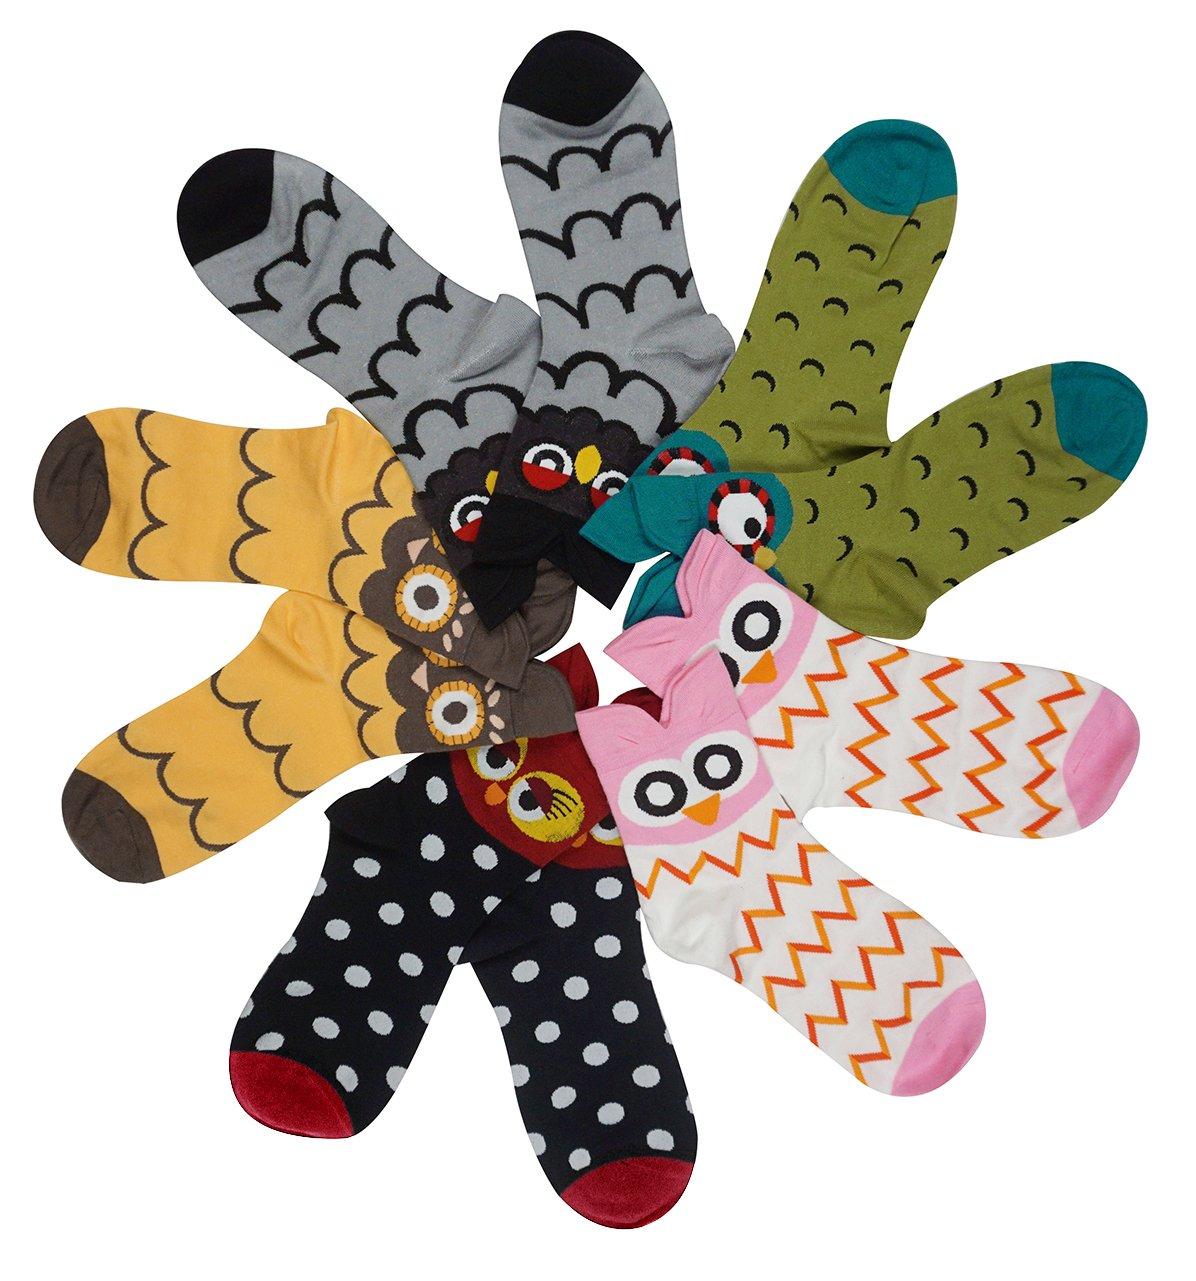 Women's Lady's Cute Owl Design Cotton Socks,5 Pairs Multi Color One Size by Bienvenu (Image #2)